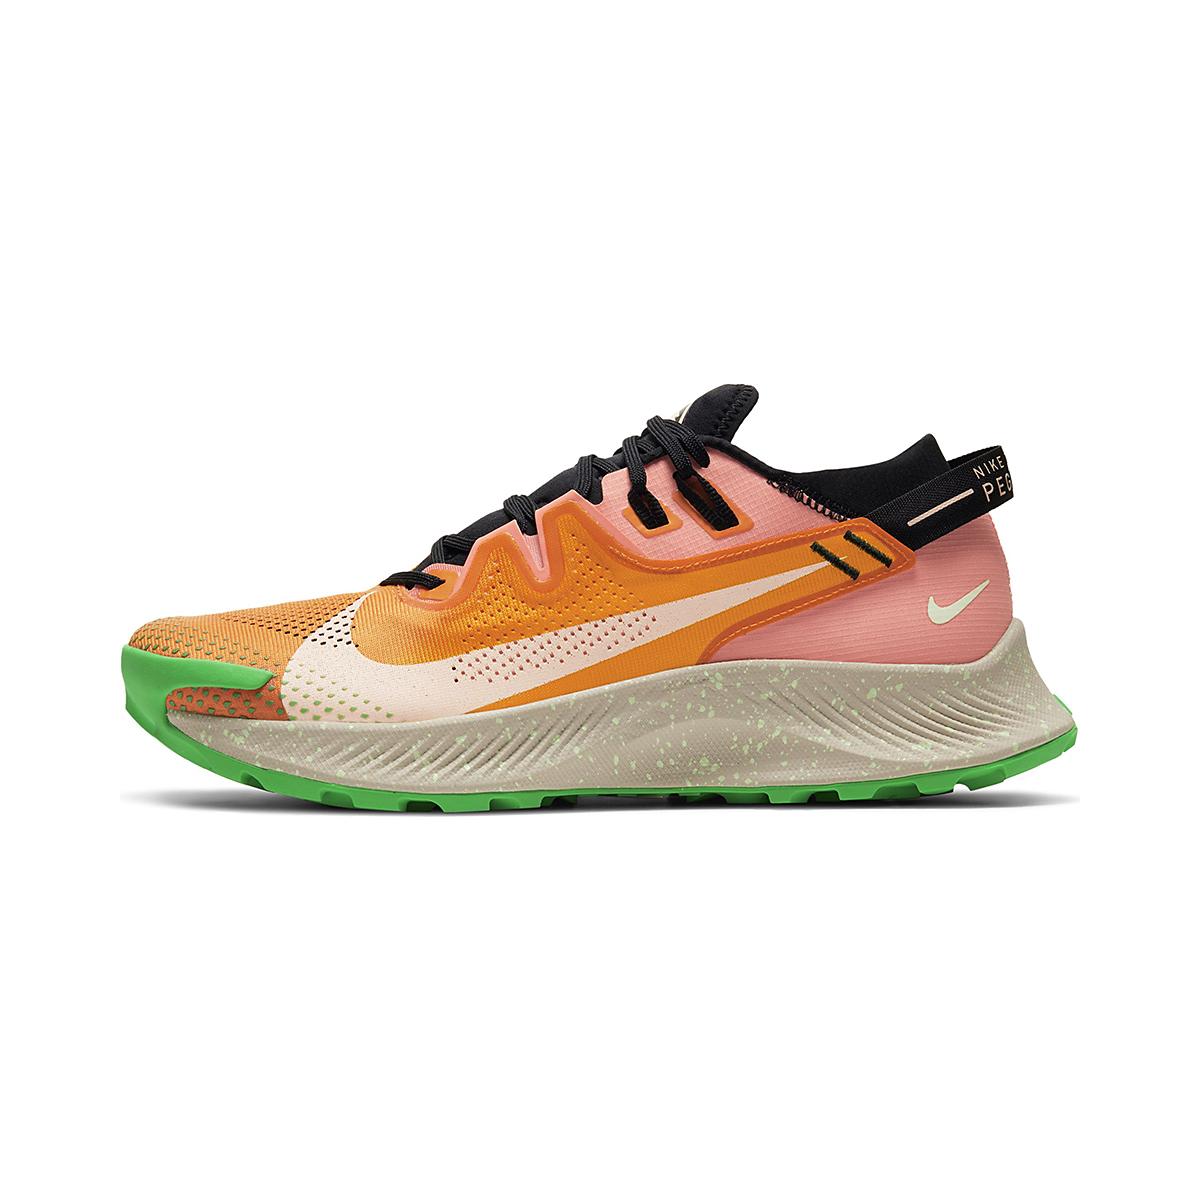 Men's Nike Pegasus Trail 2 Trail Running Shoe - Color: Kumquat/Crimson - Size: 6 - Width: Regular, Kumquat/Crimson, large, image 2